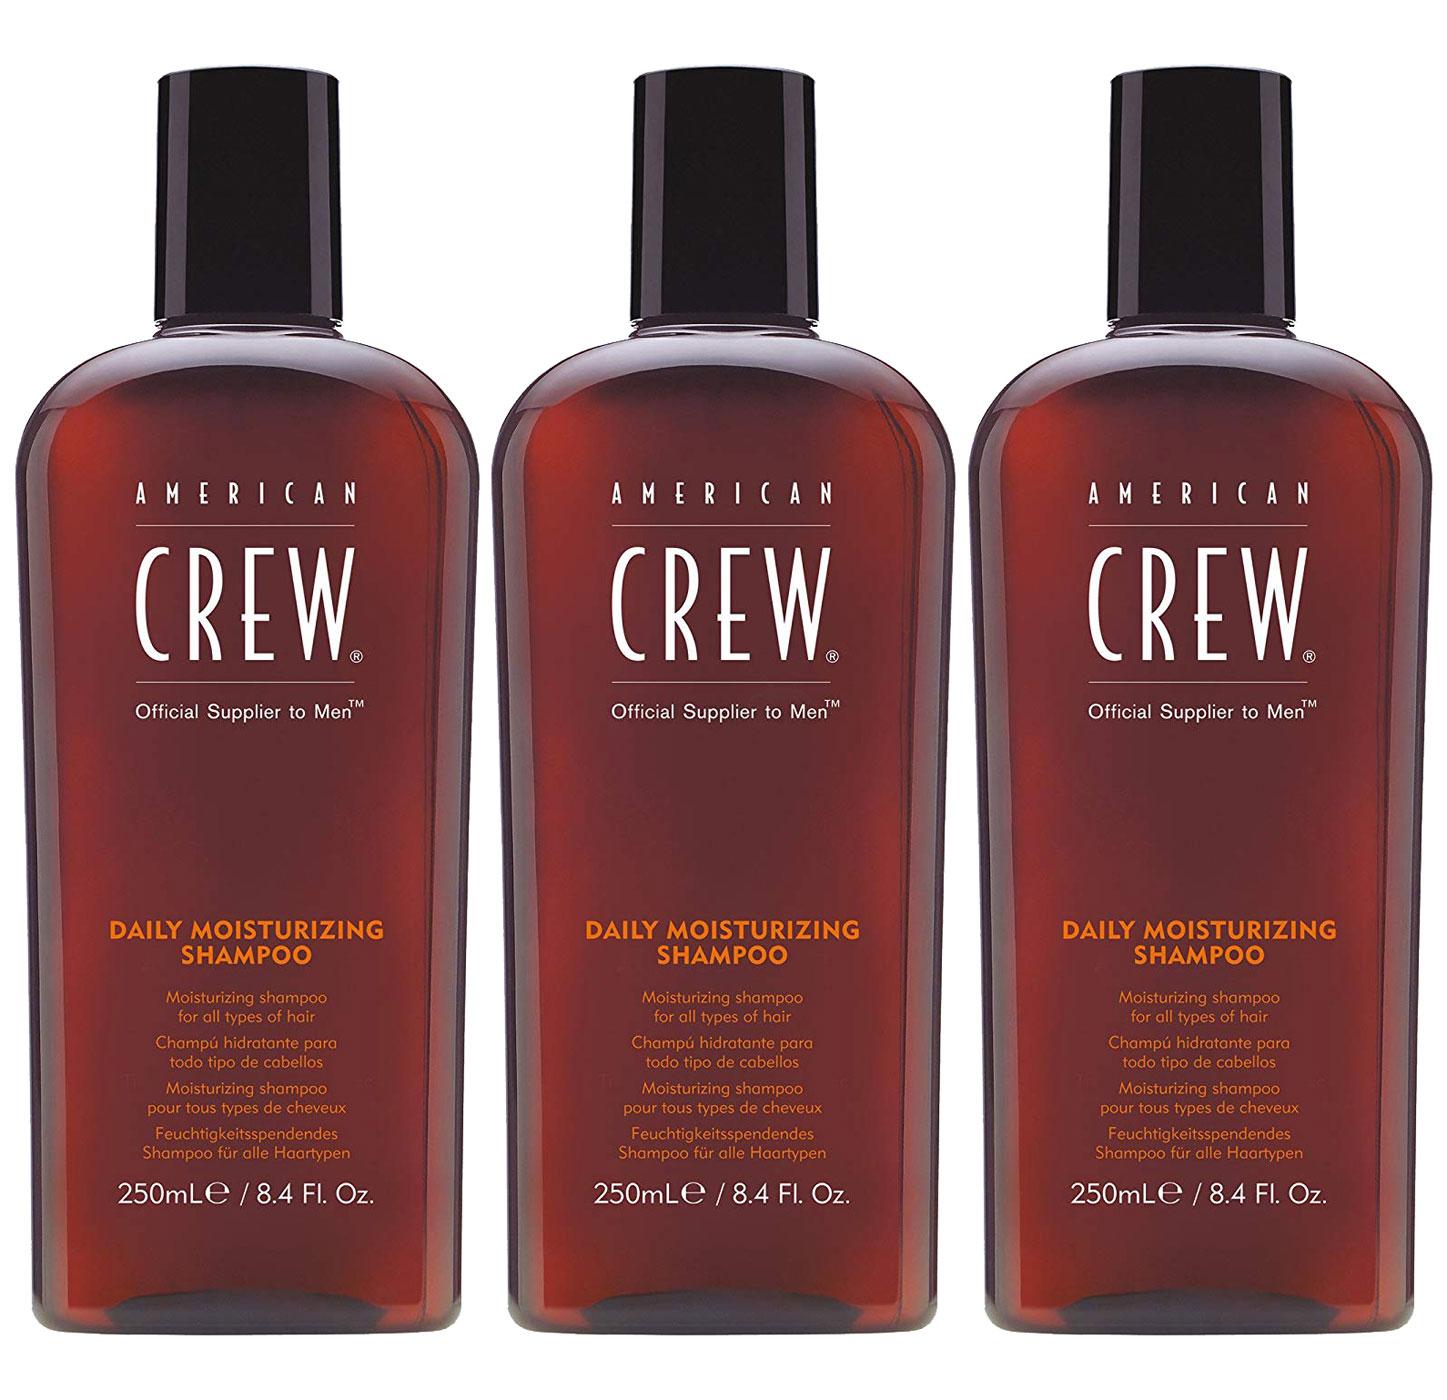 American Crew Classic Daily Moisturizing Shampoo Aktion - 3x 250ml = 750ml